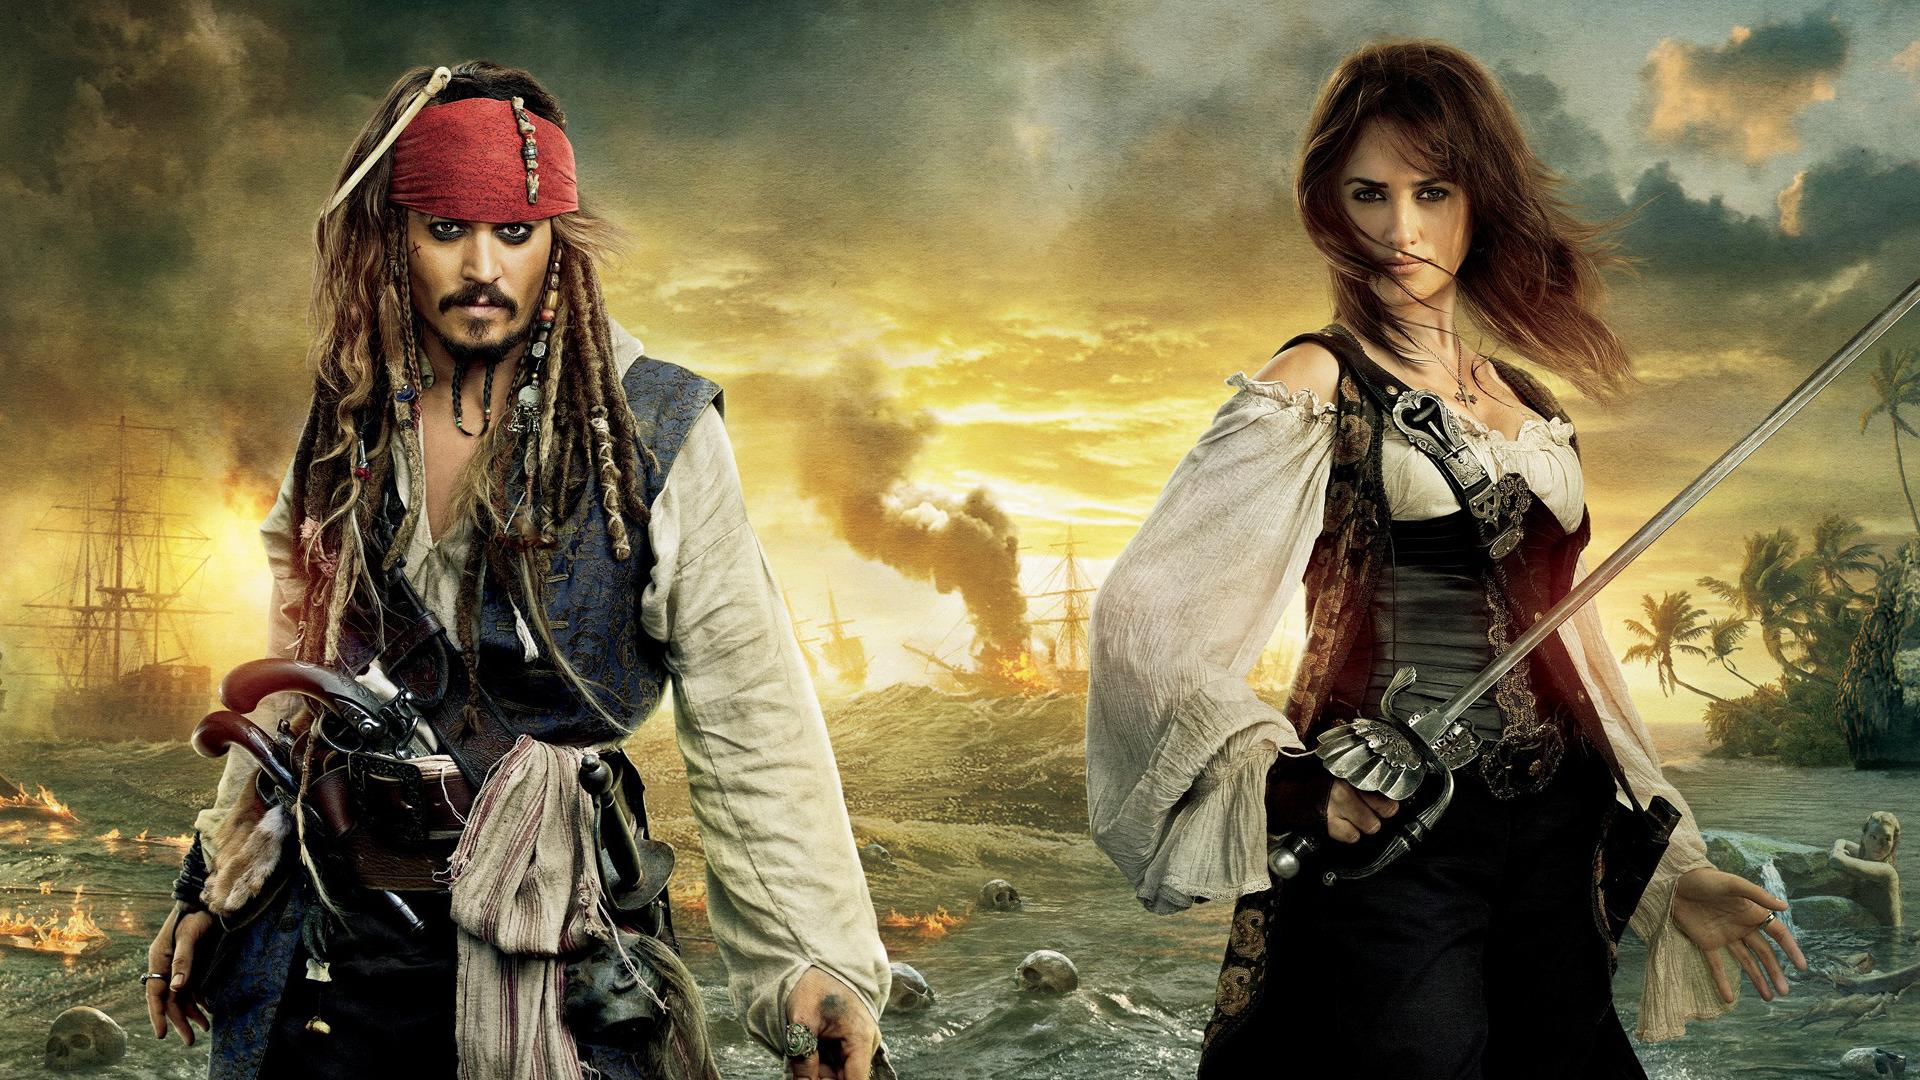 Movie pirate teen #10